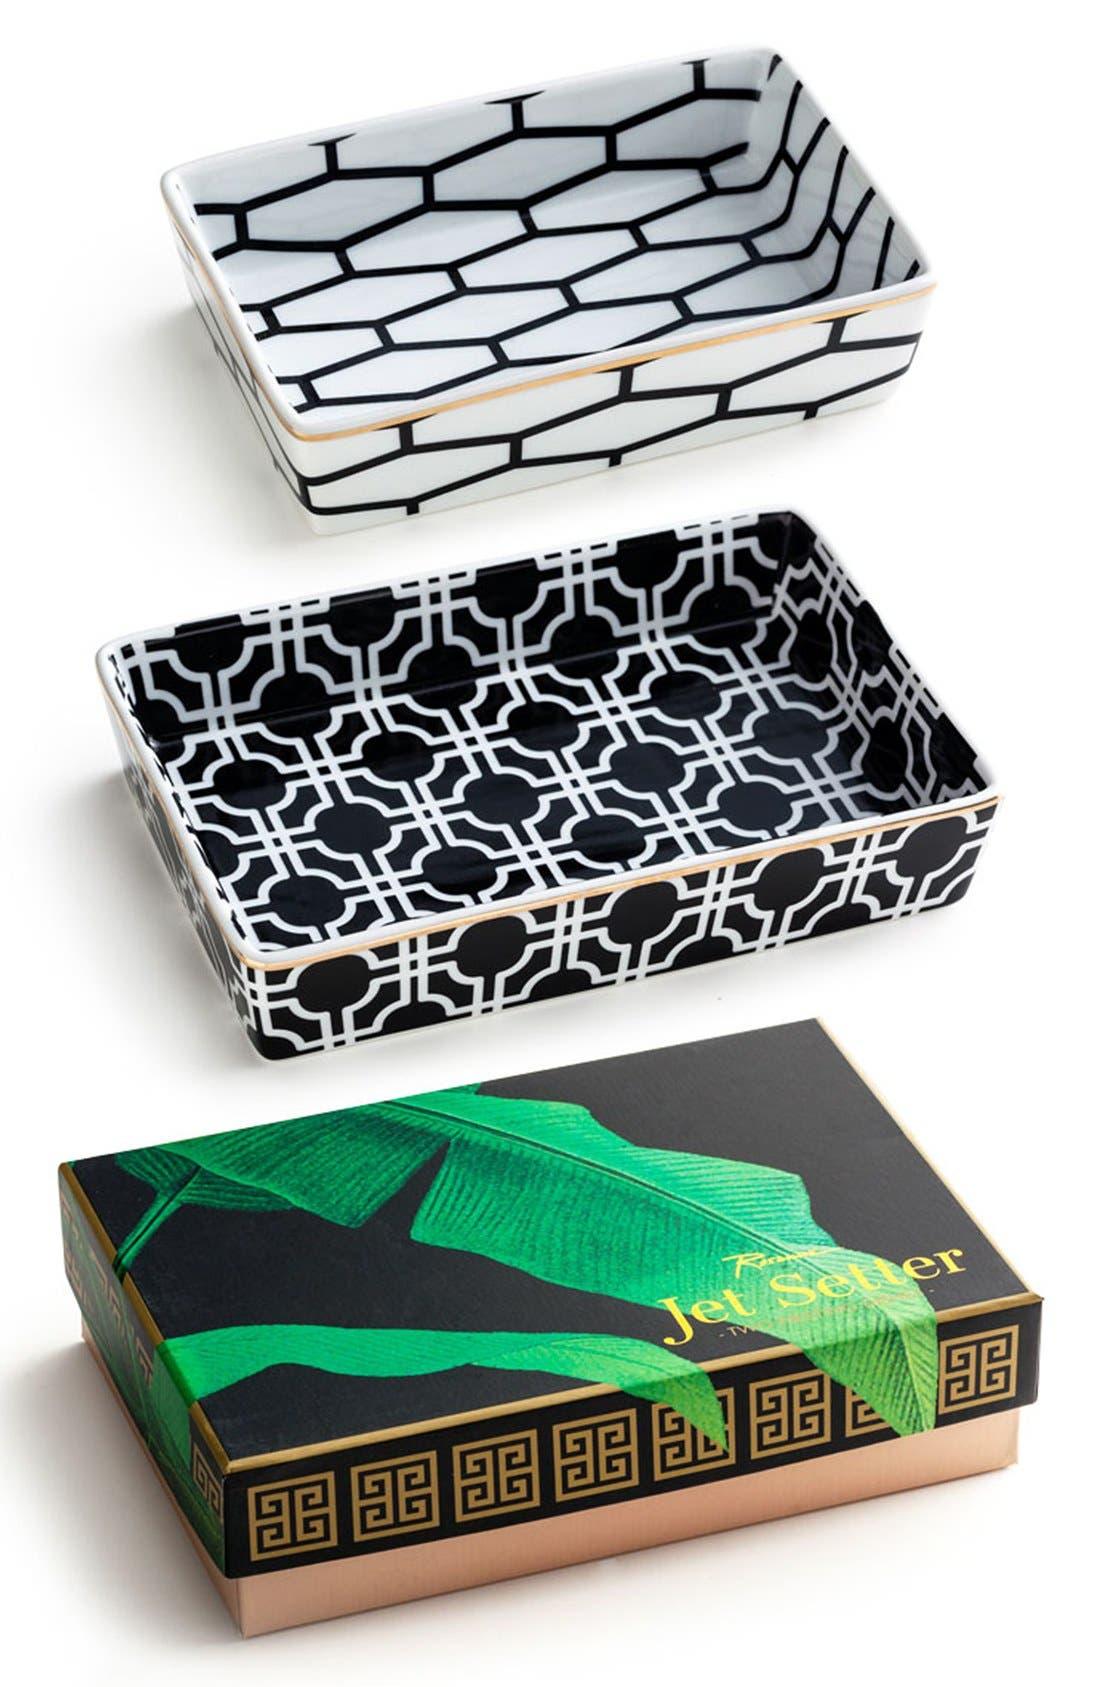 Main Image - Rosanna Geometric Nesting Trays (Set of 2)